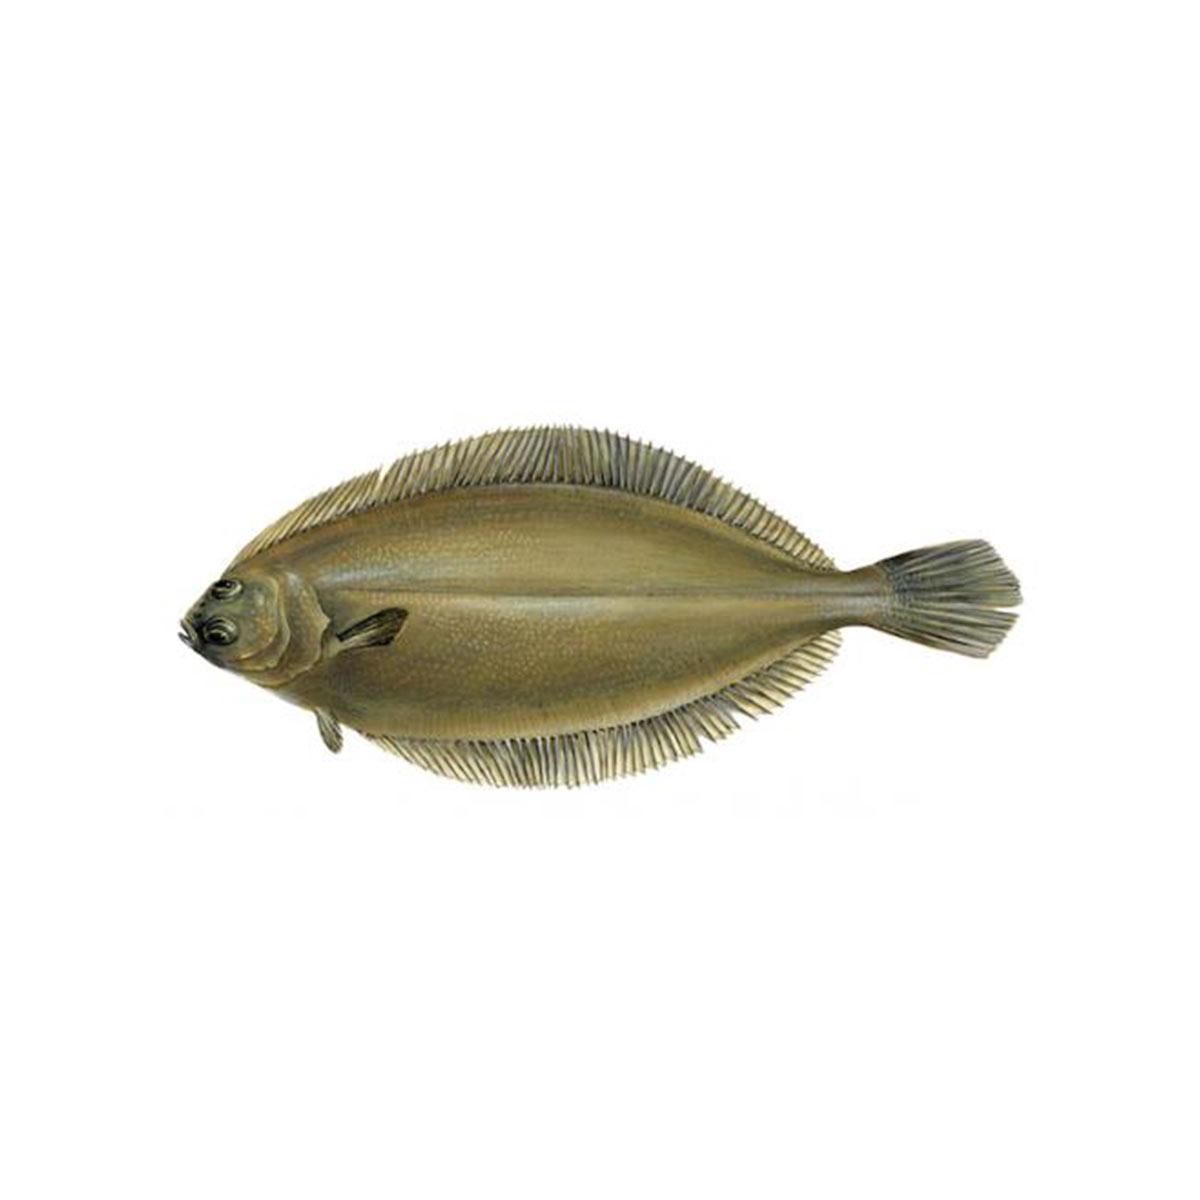 lengua-cynoglossus-senegalensis-sw